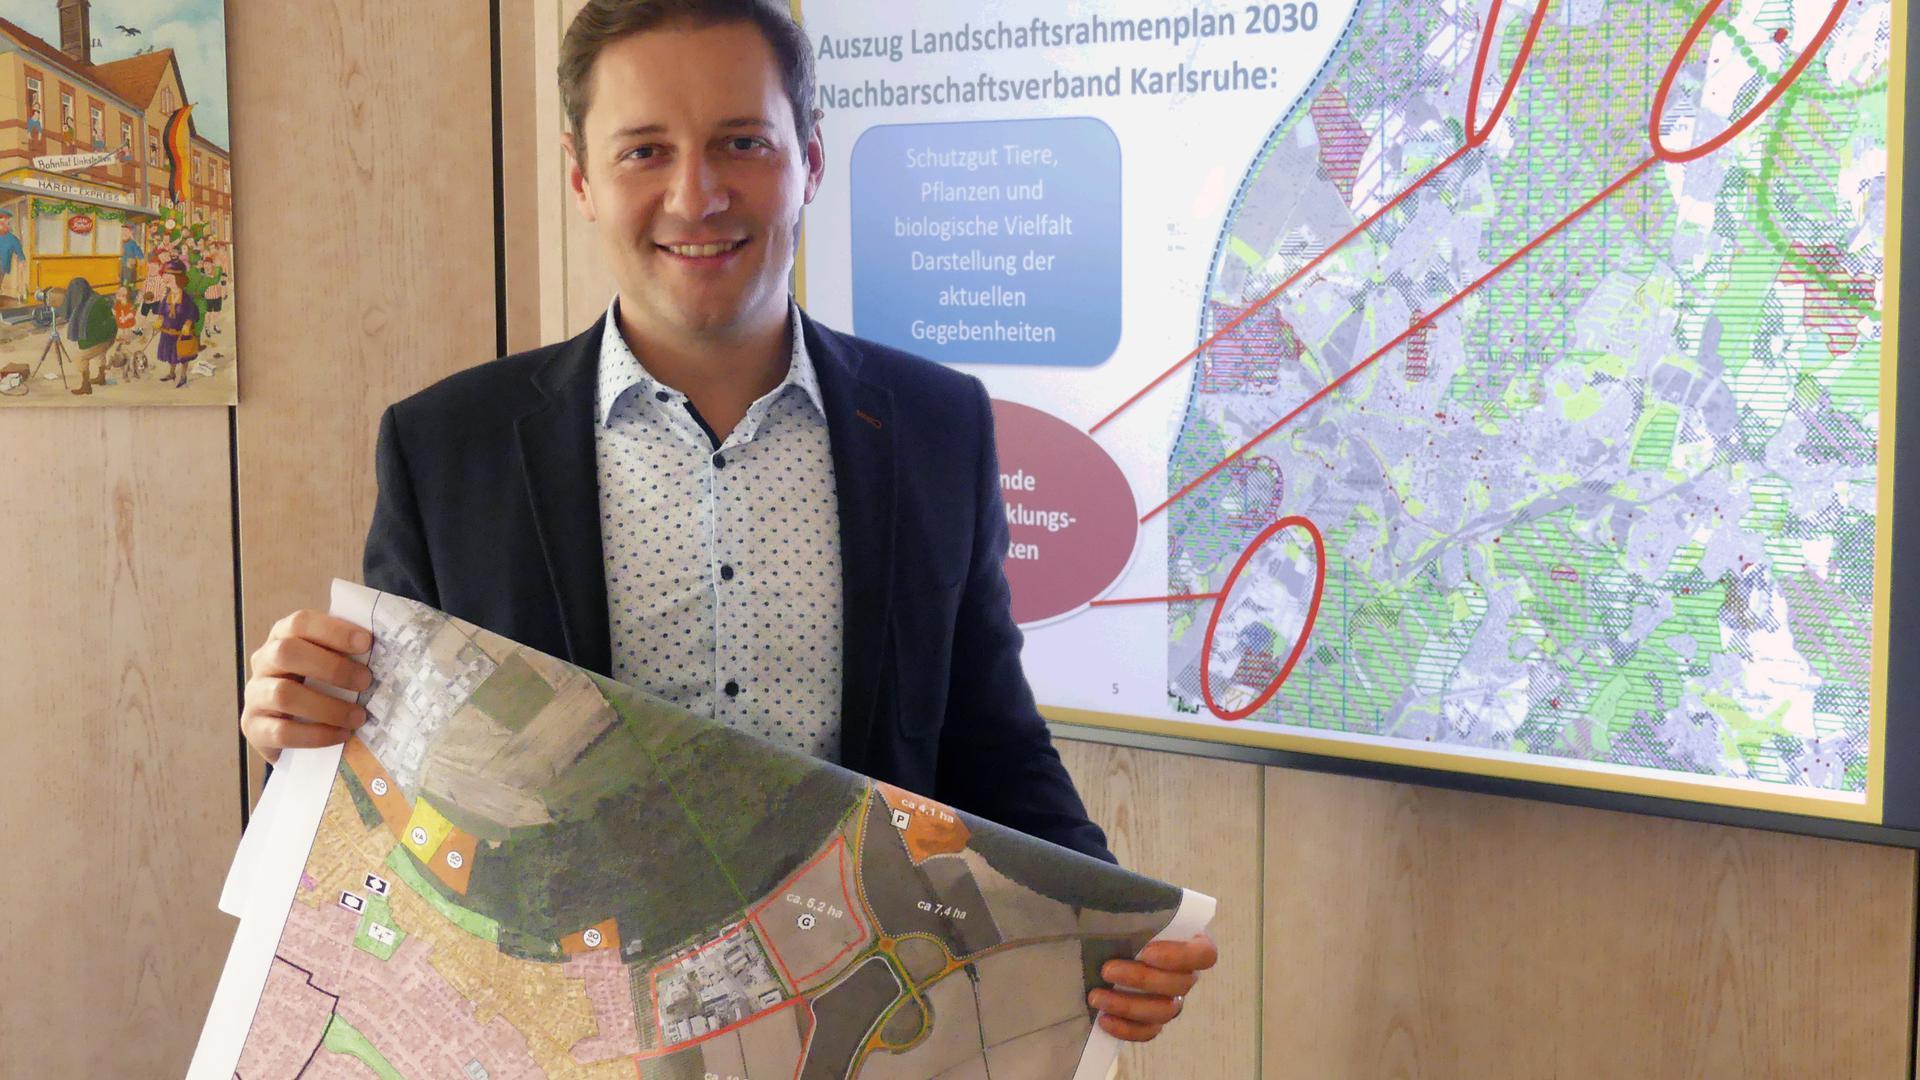 Bürgermeister Michael Möslang